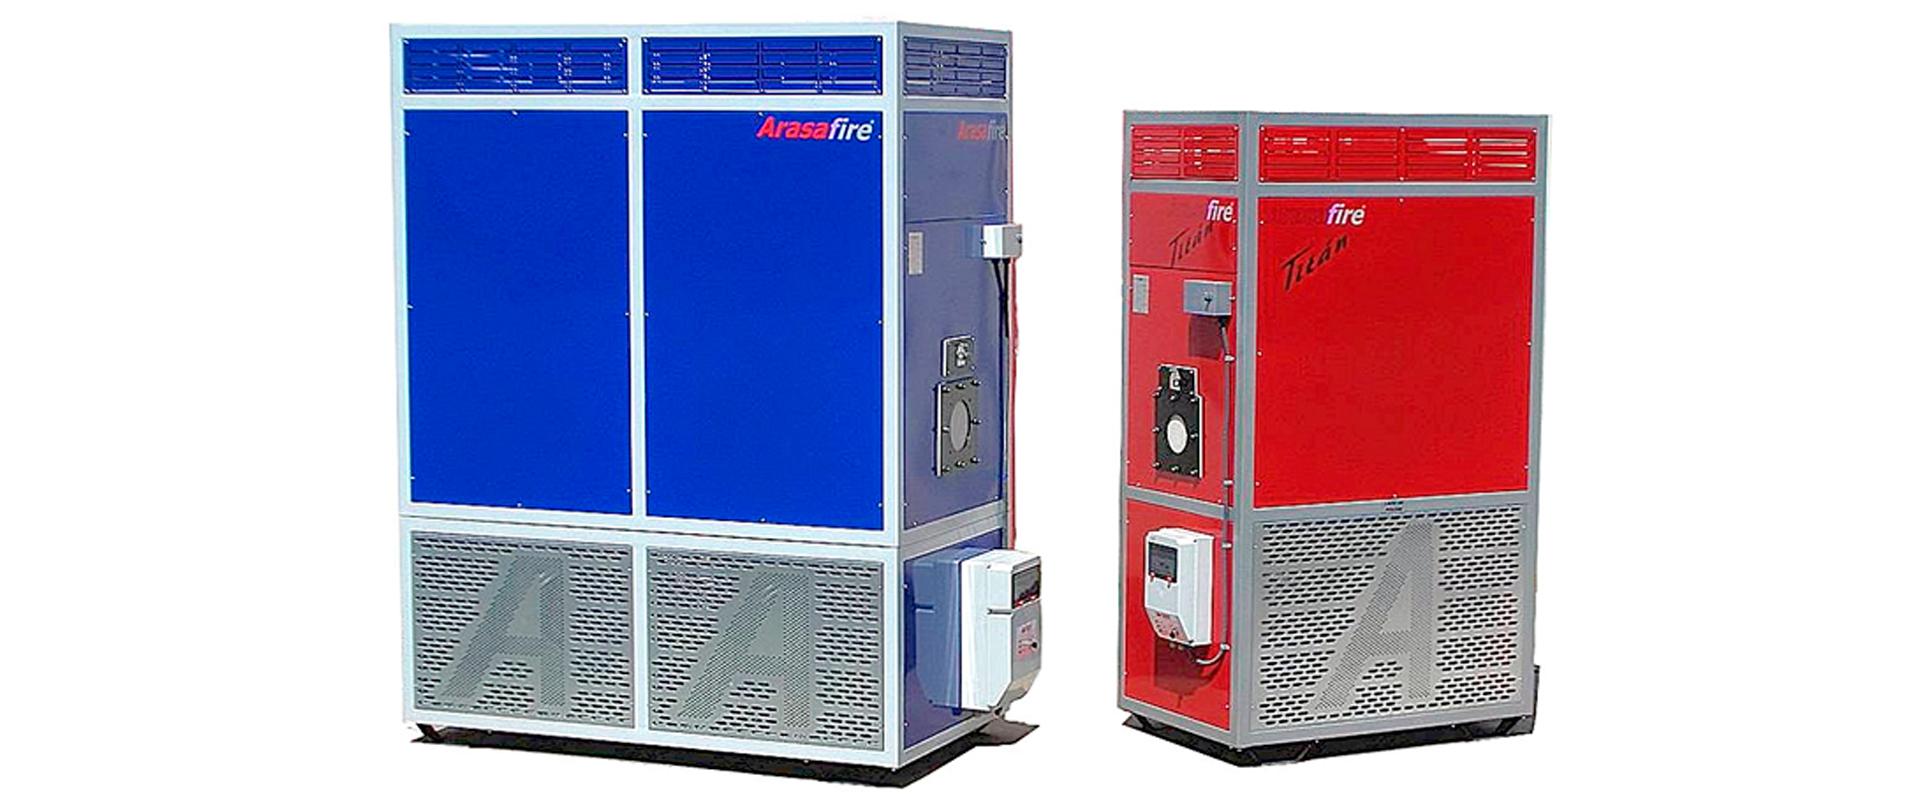 04_generadores aire caliente.png